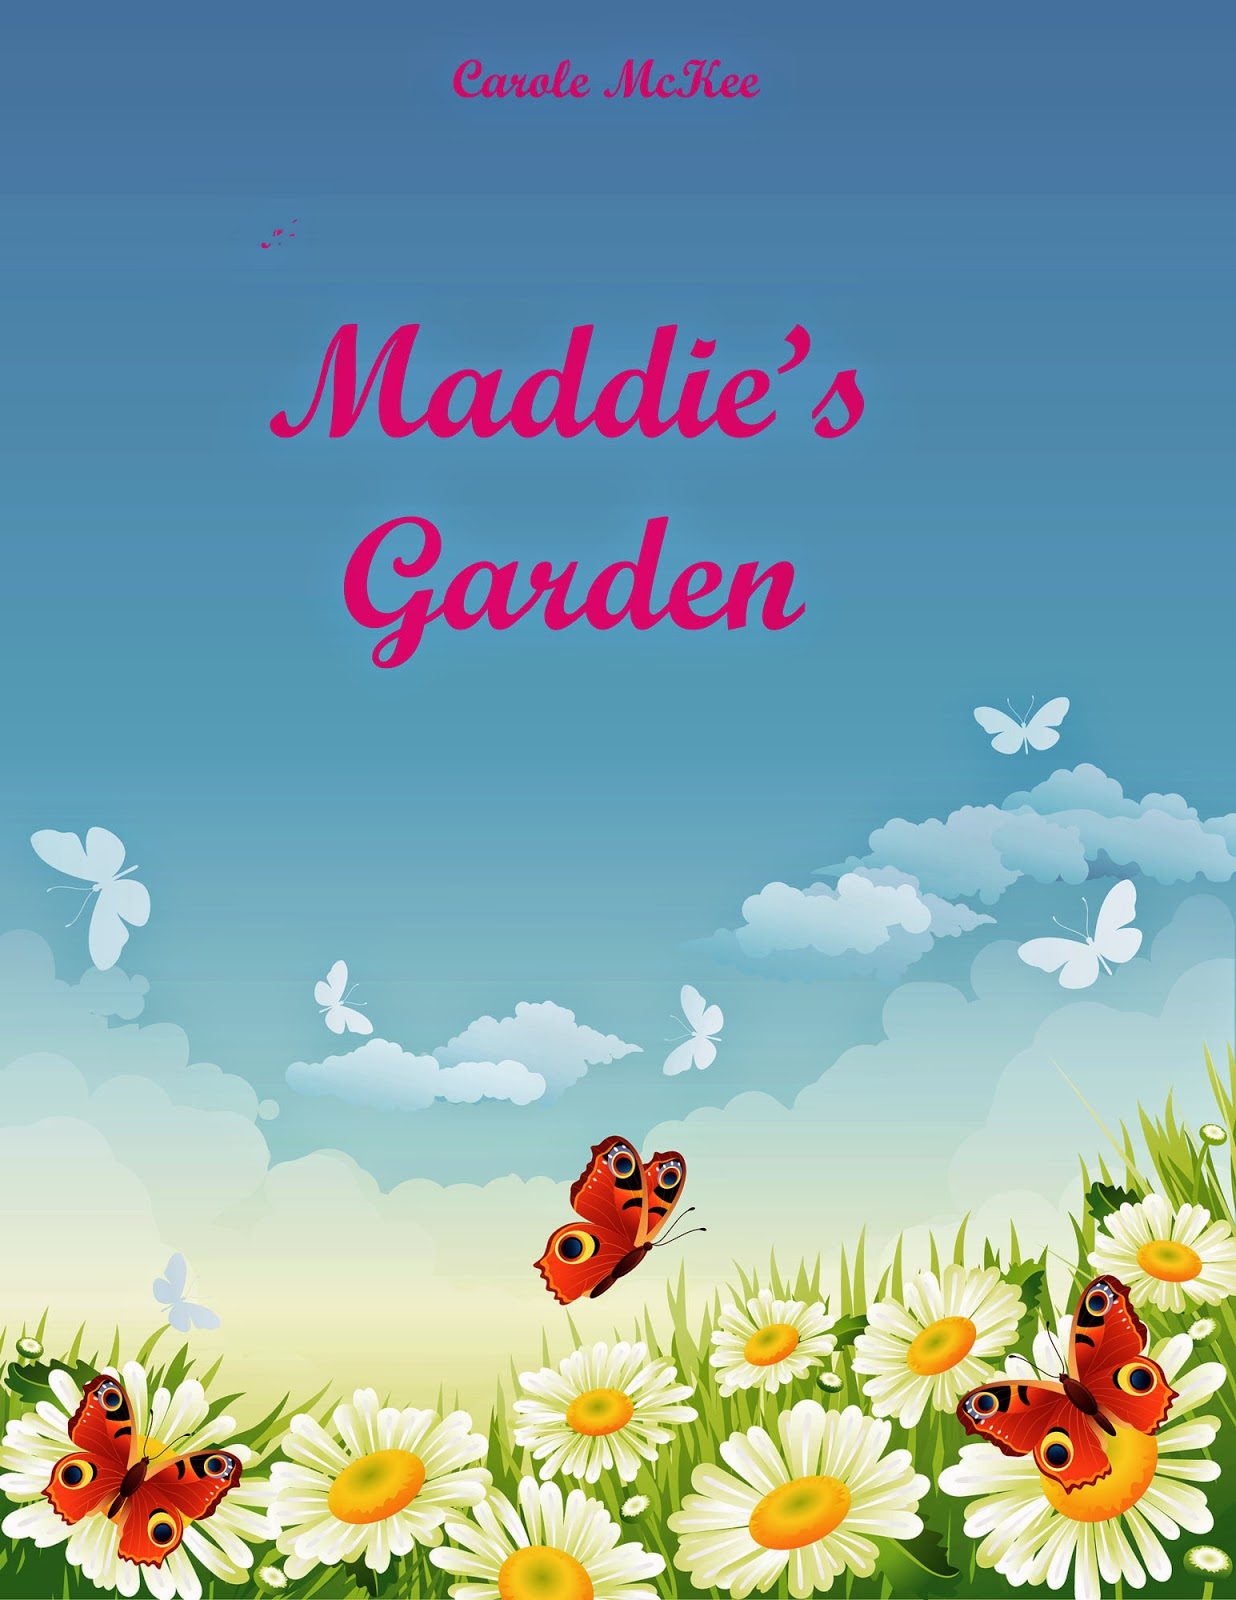 http://www.amazon.com/Maddies-Garden-Carole-McKee-ebook/dp/B006WRG9TQ/ref=la_B0082D3810_1_8?s=books&ie=UTF8&qid=1402898660&sr=1-8